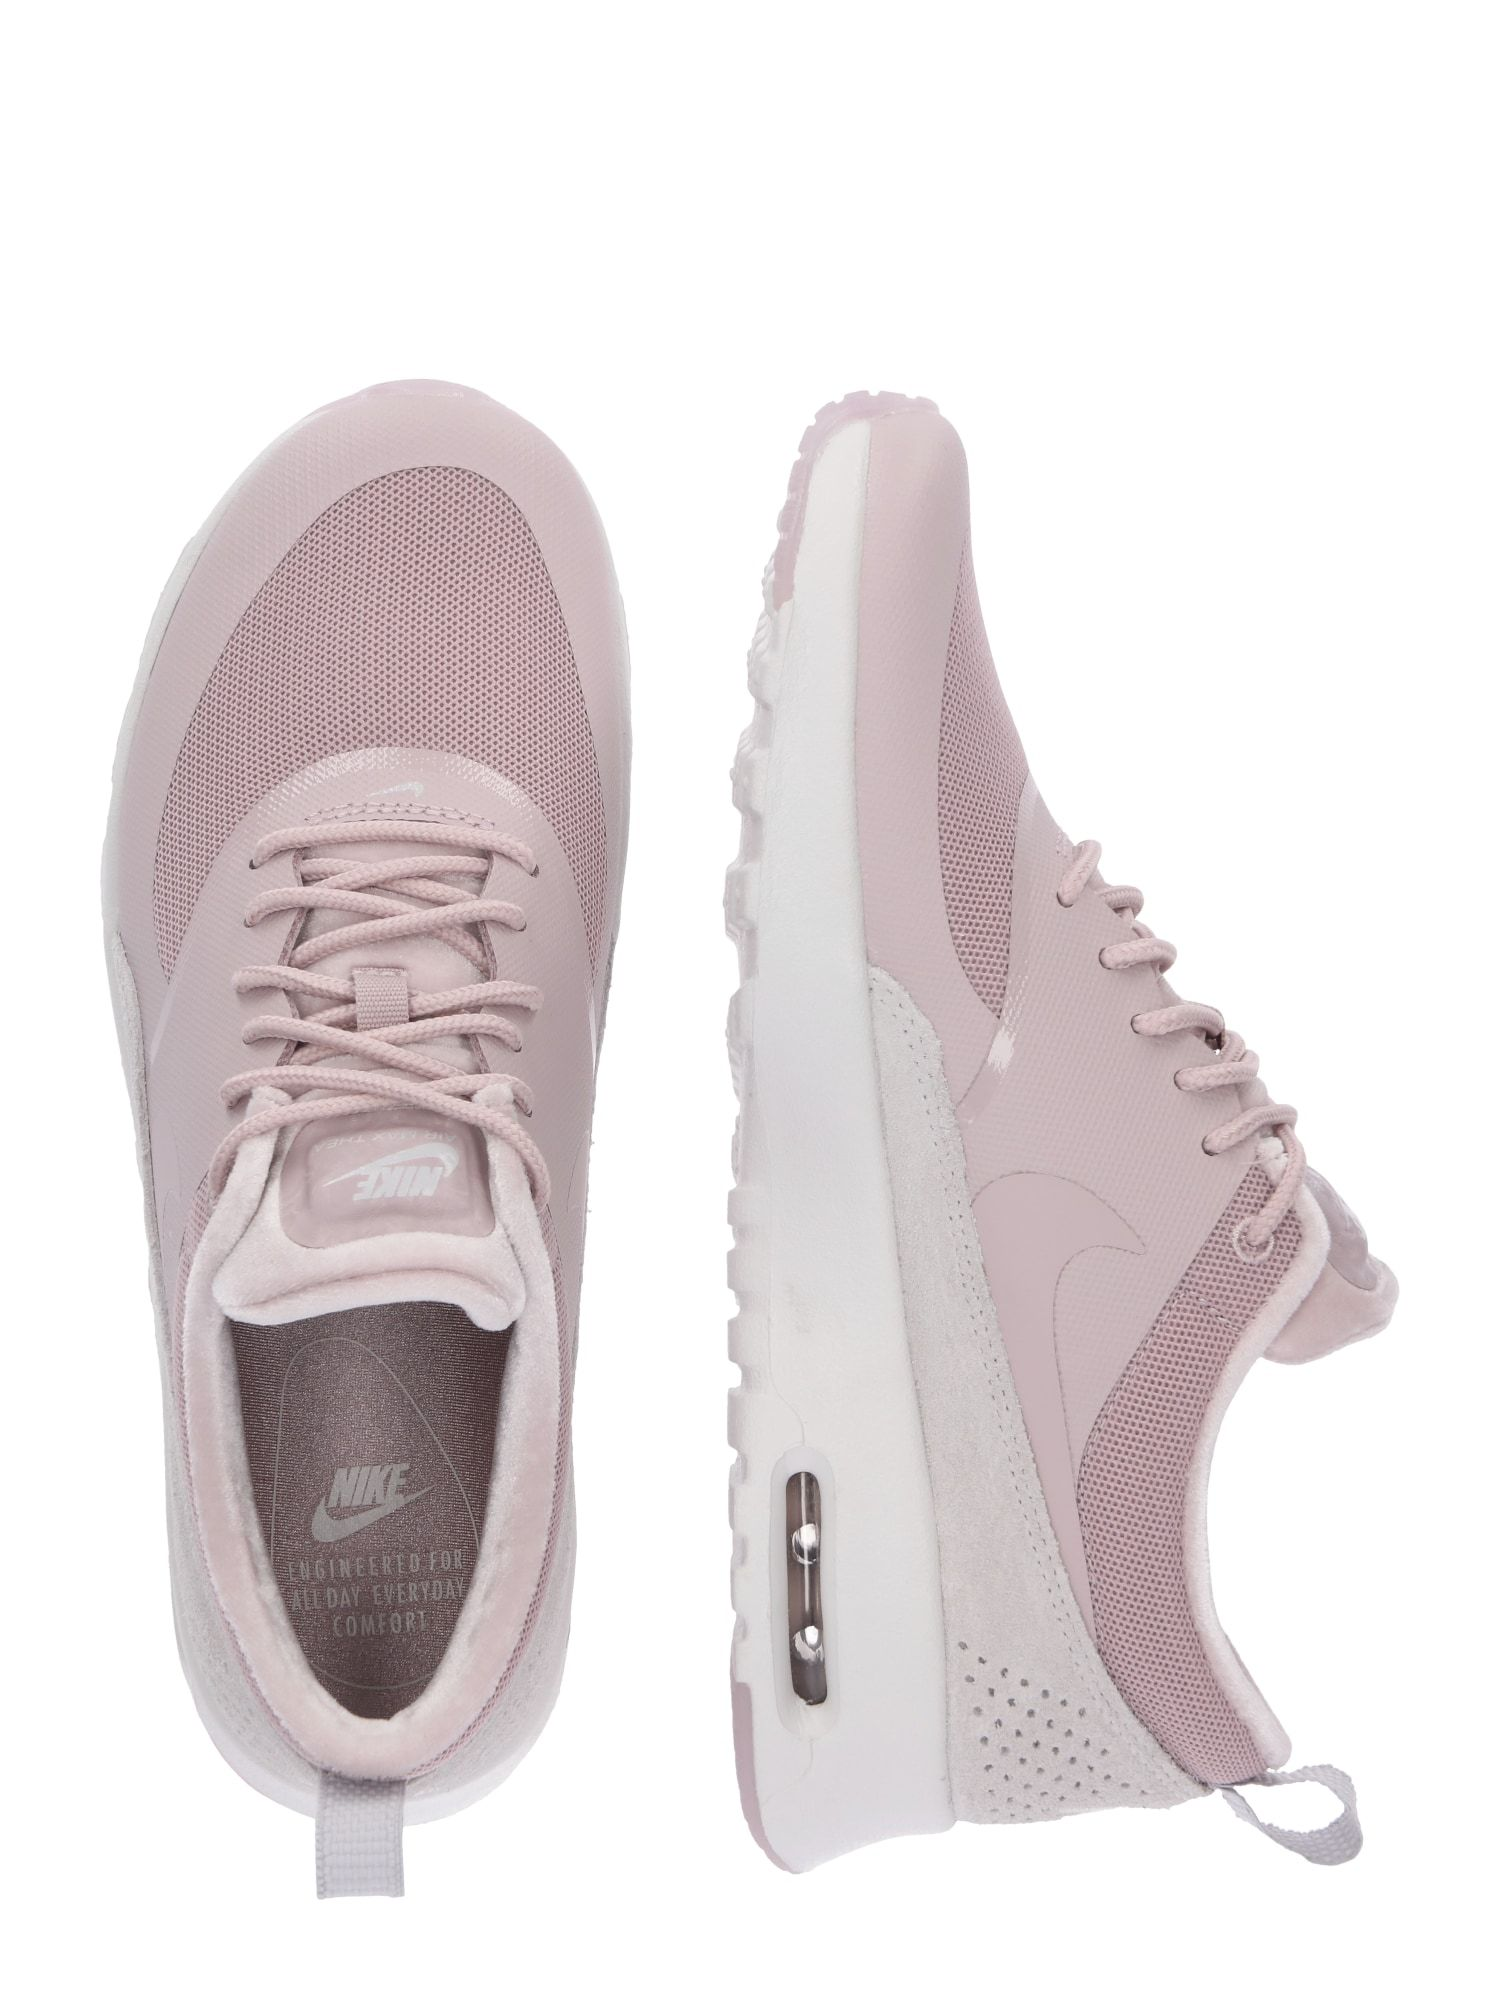 Nike Sportswear Sneaker 'Air Max Thea LX' Damen, Rosa Weiß